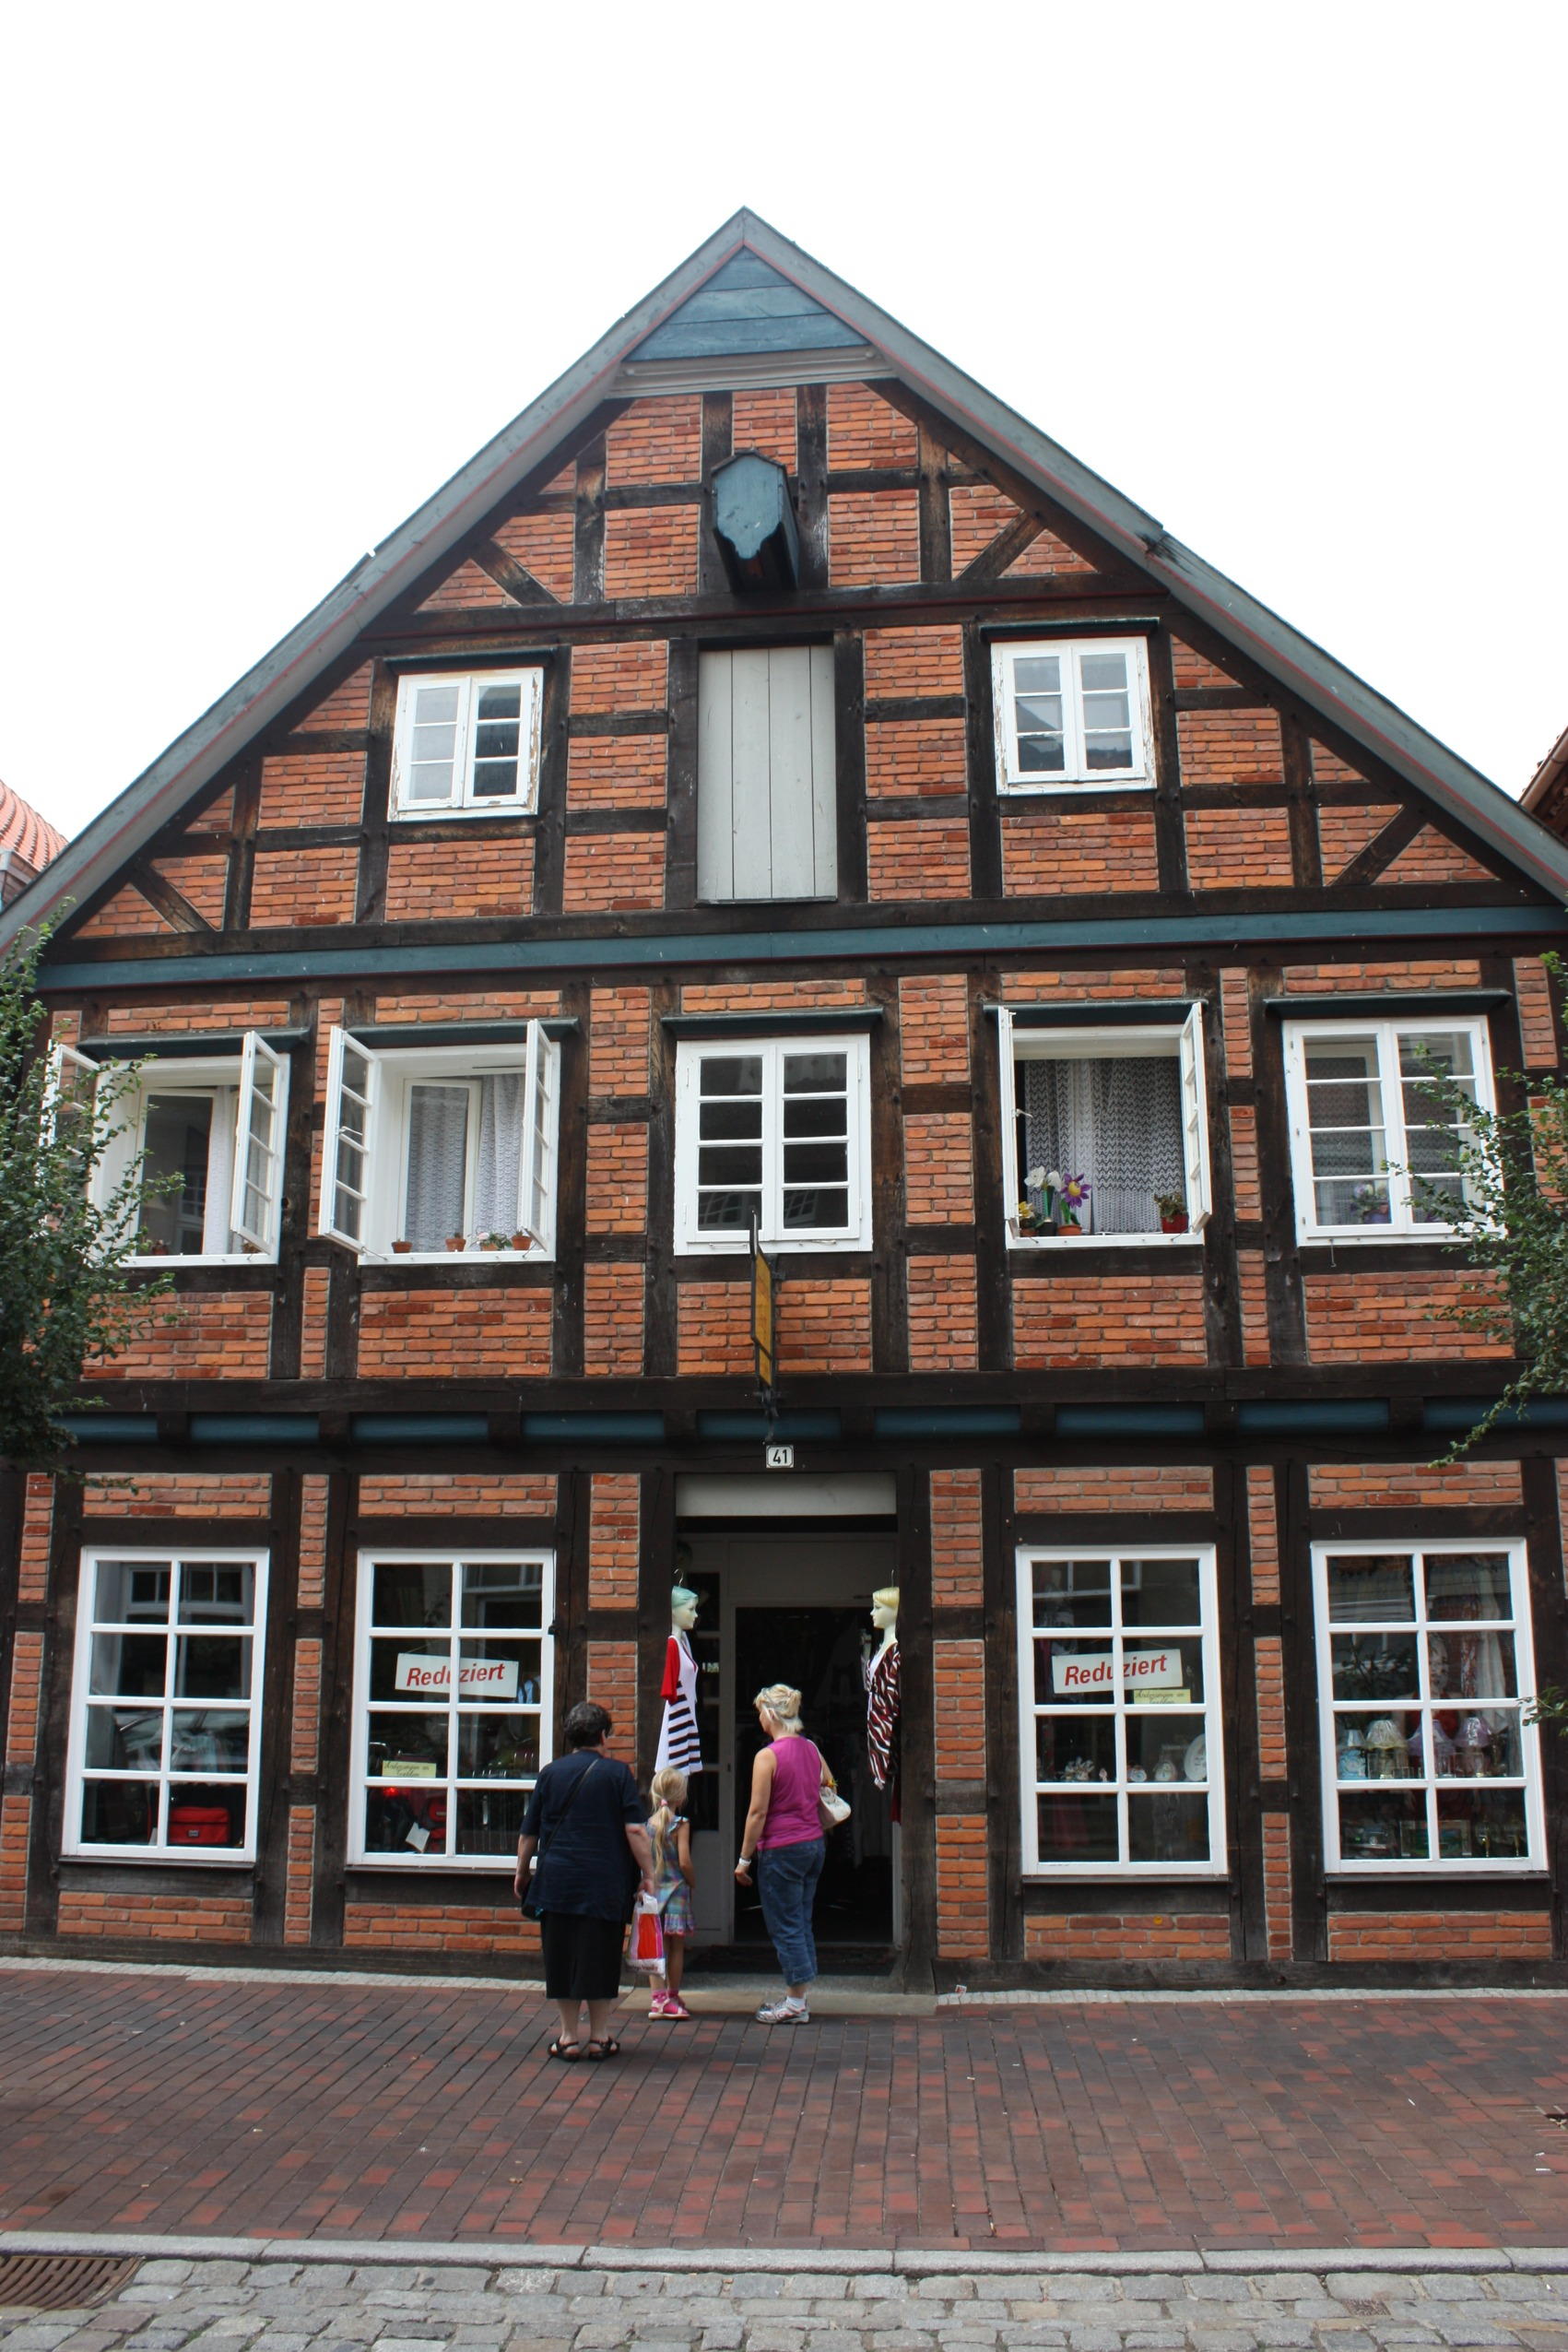 in elbe Hotel dannenberg